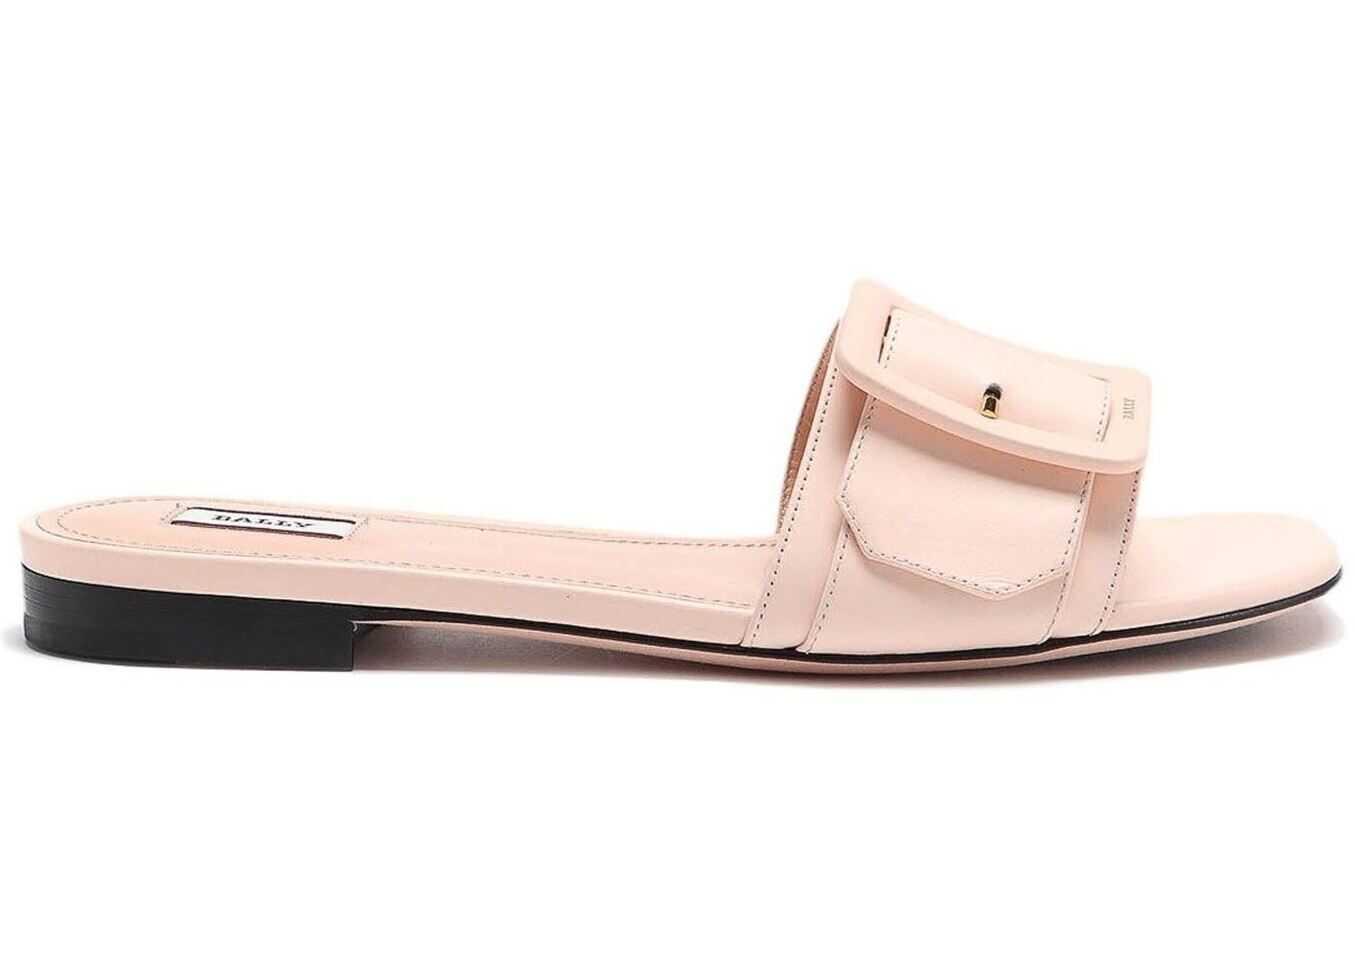 Bally Janna Pink Leather Slide Sandals Pink